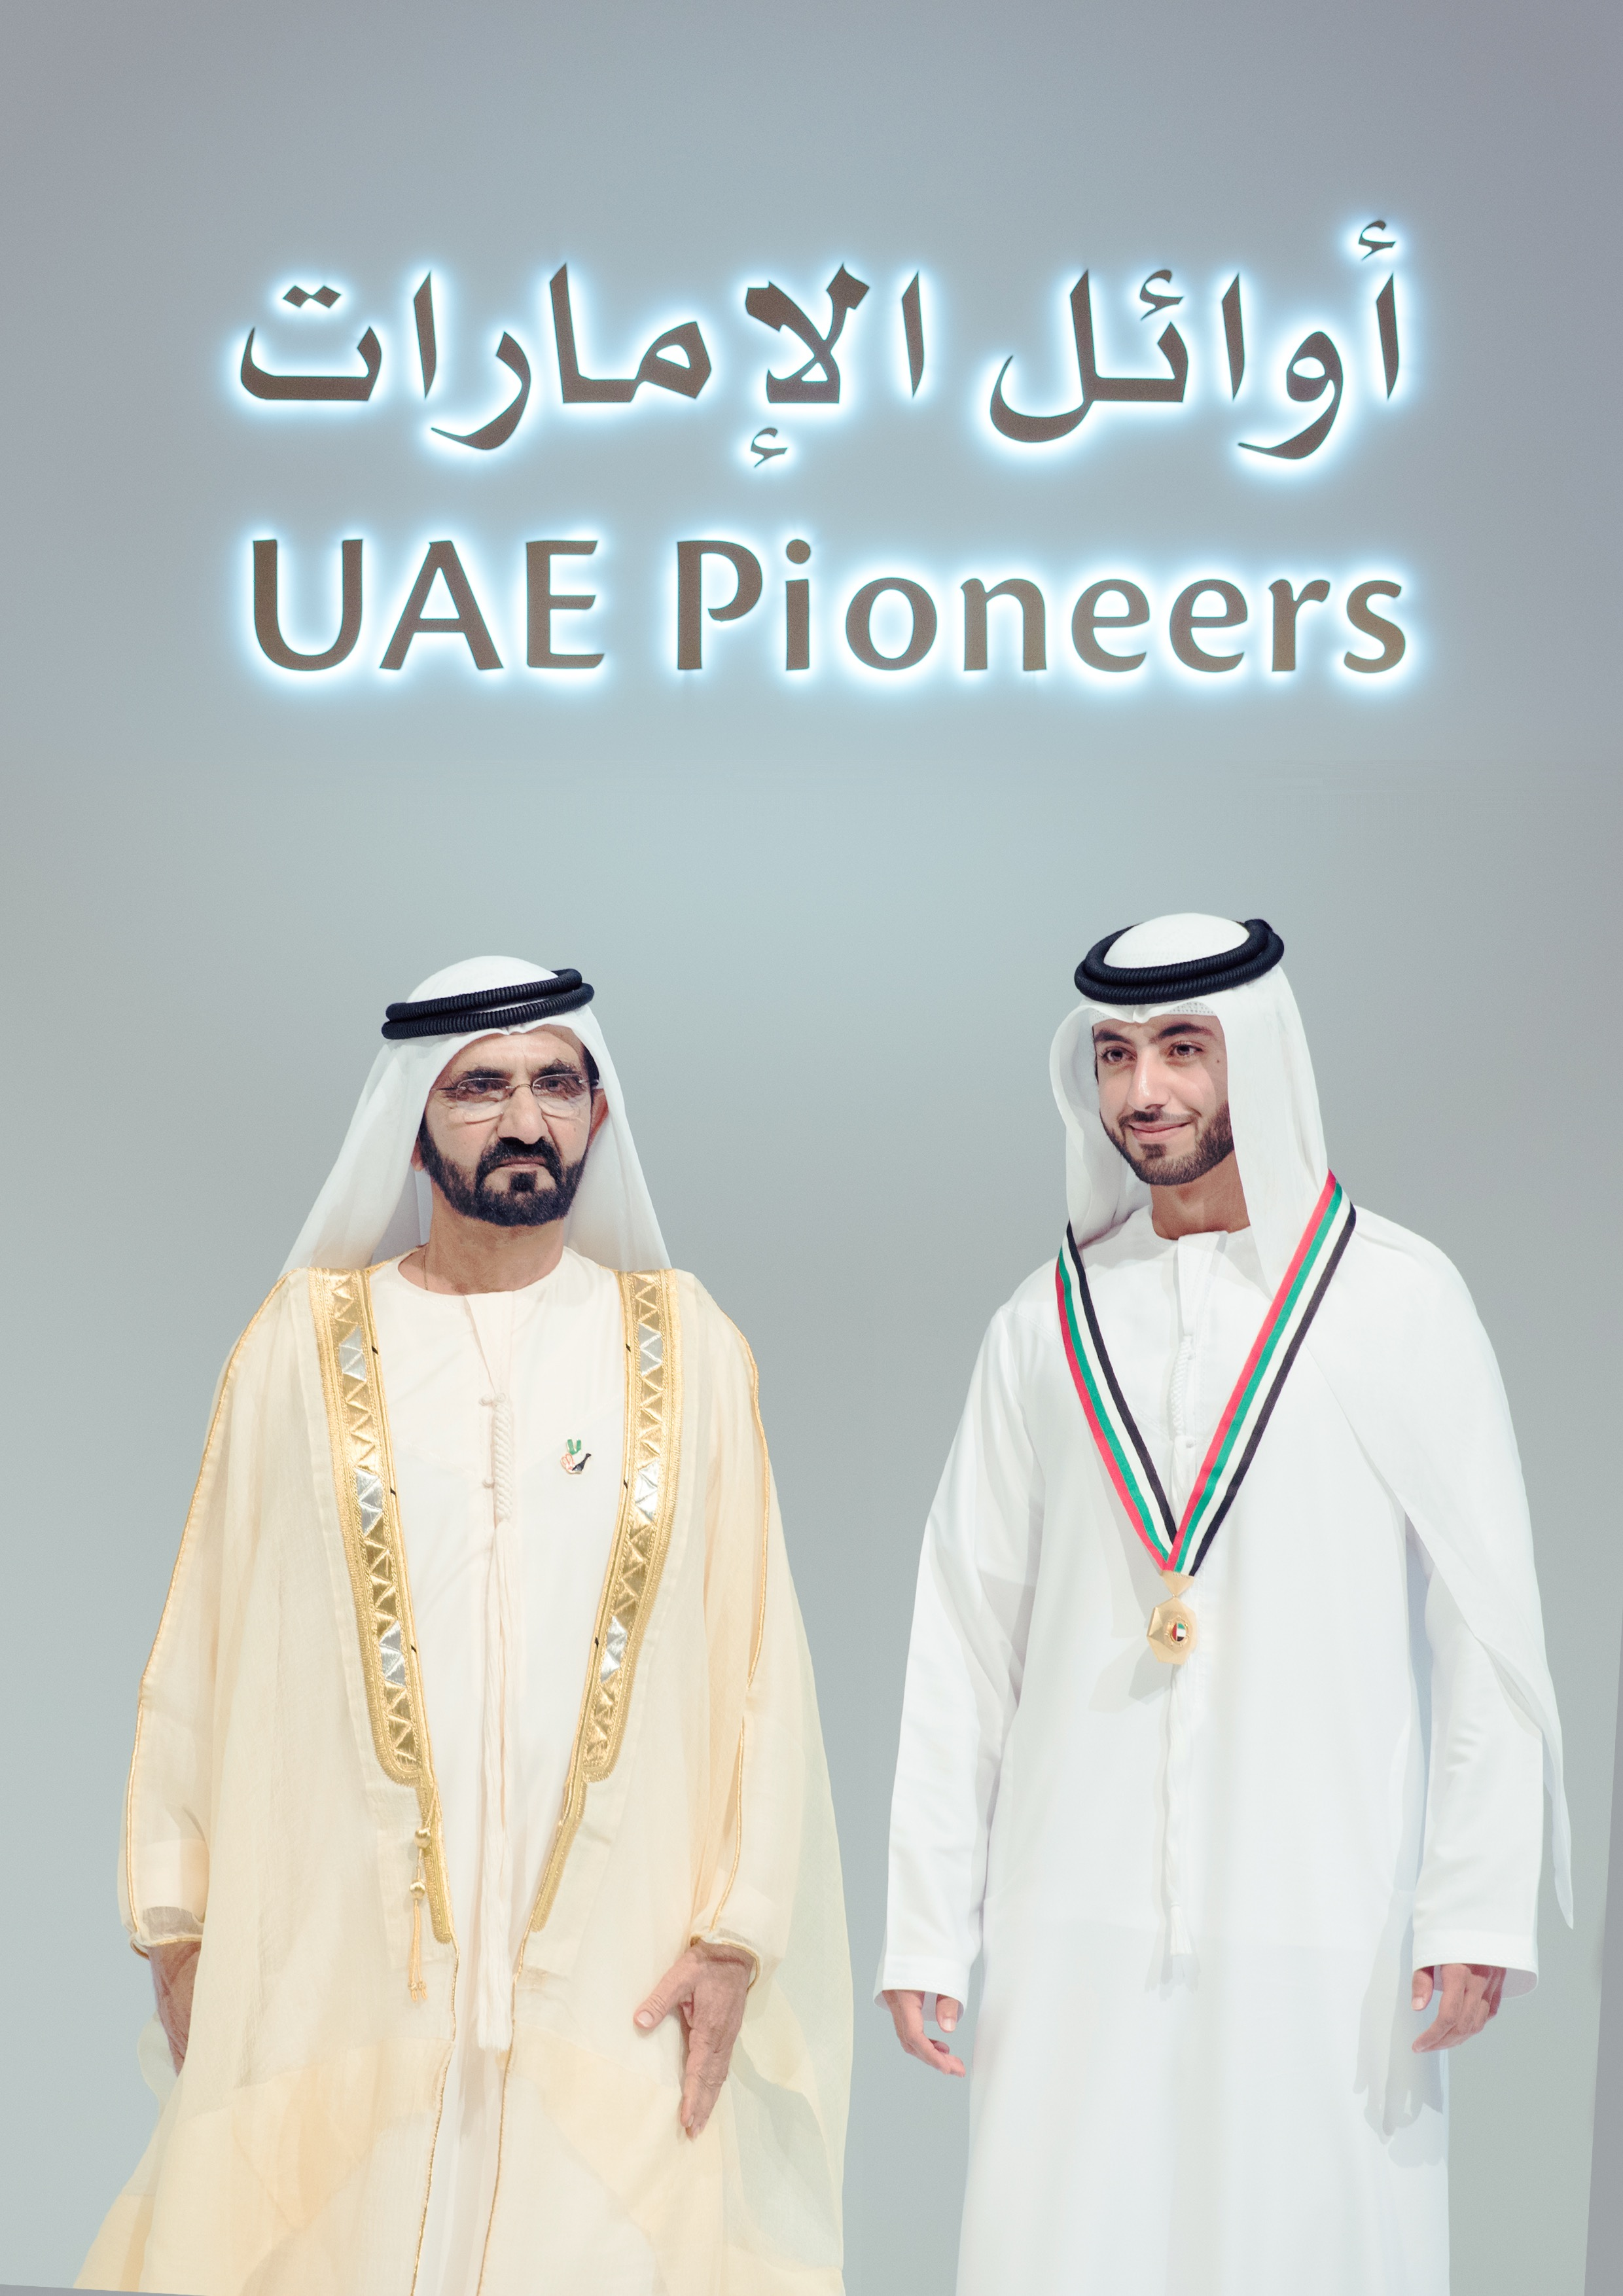 Fadila Al Shaikh Mohammed Bin Saeed Bin Ghobash - First Emirati College Graduate